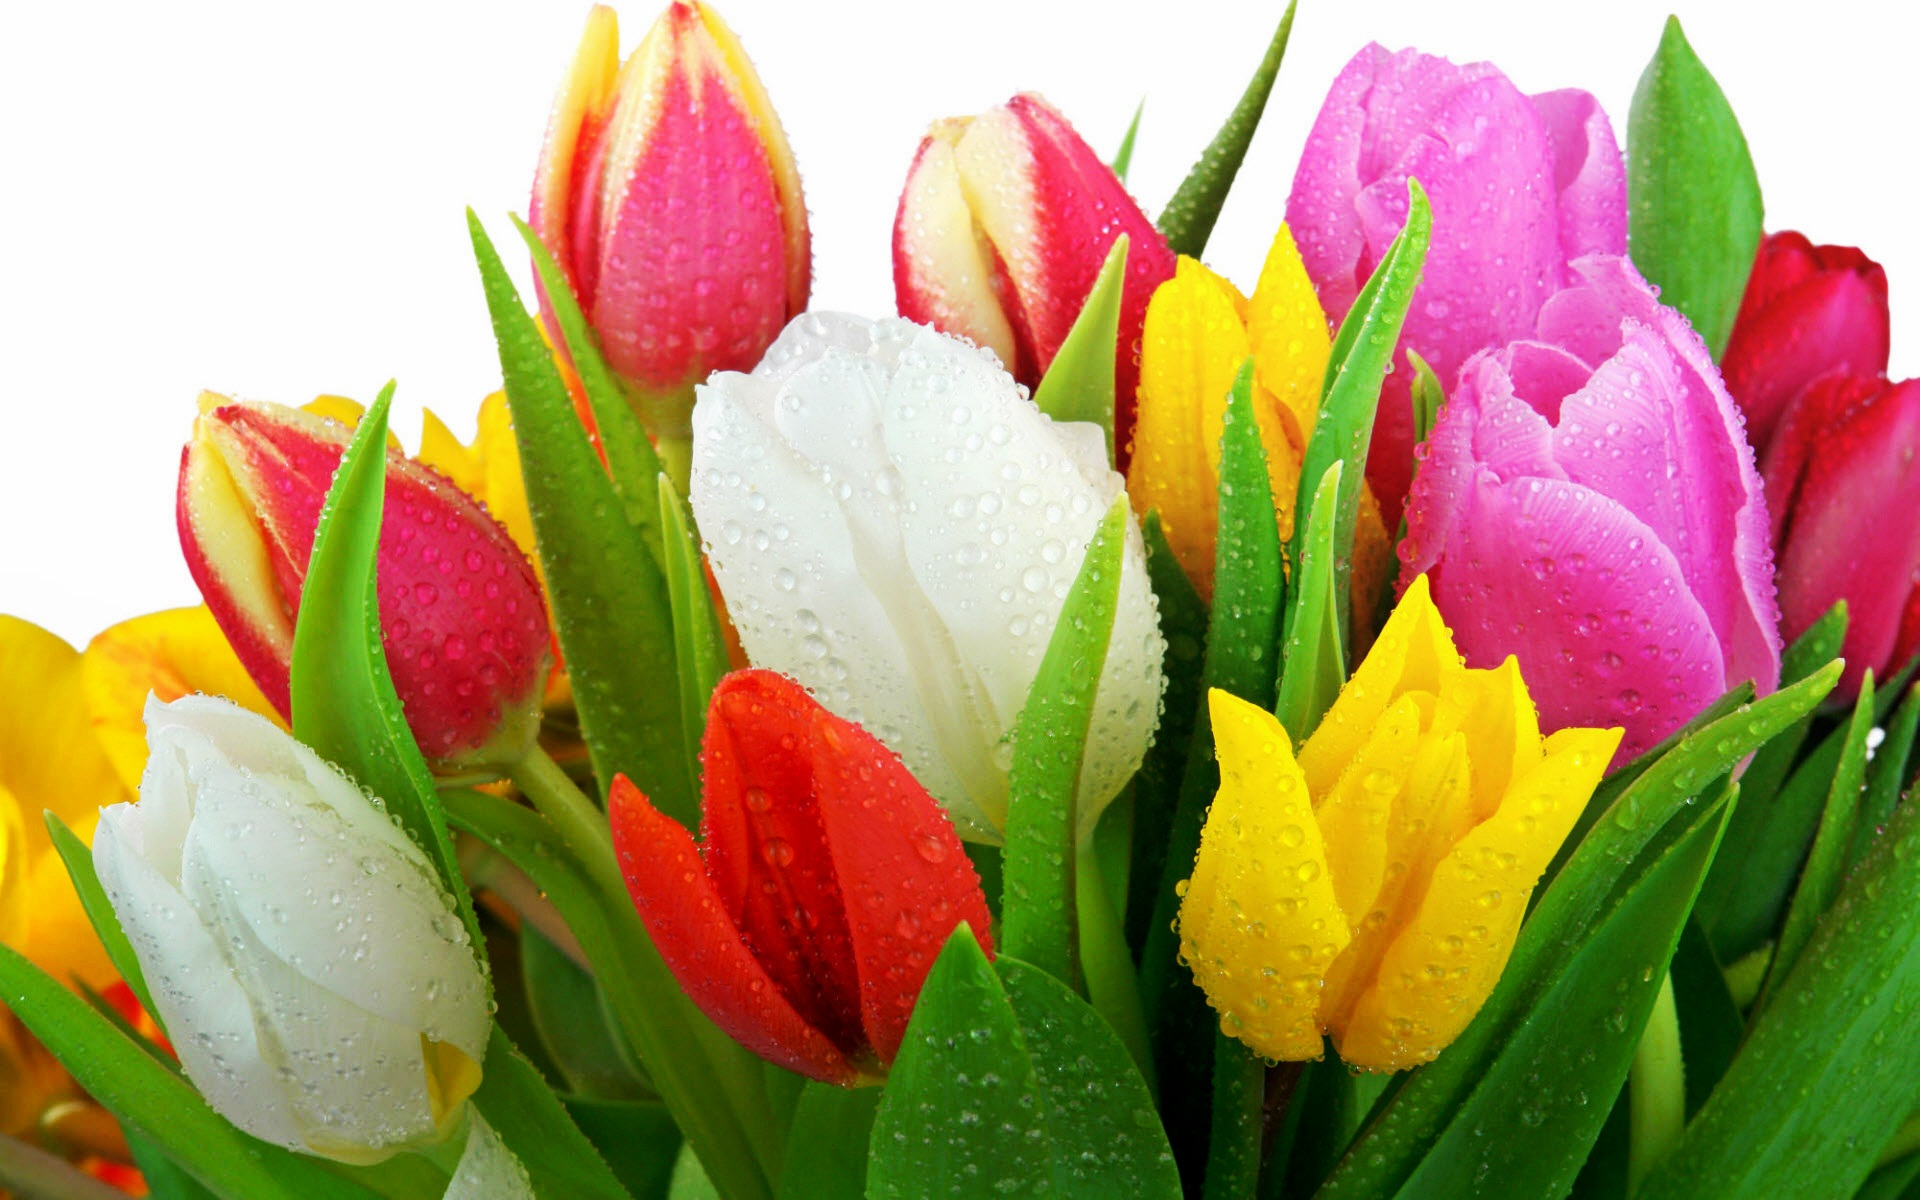 Photos of tulip flowers jpg royalty free download Tulip flowers pics - ClipartFest jpg royalty free download